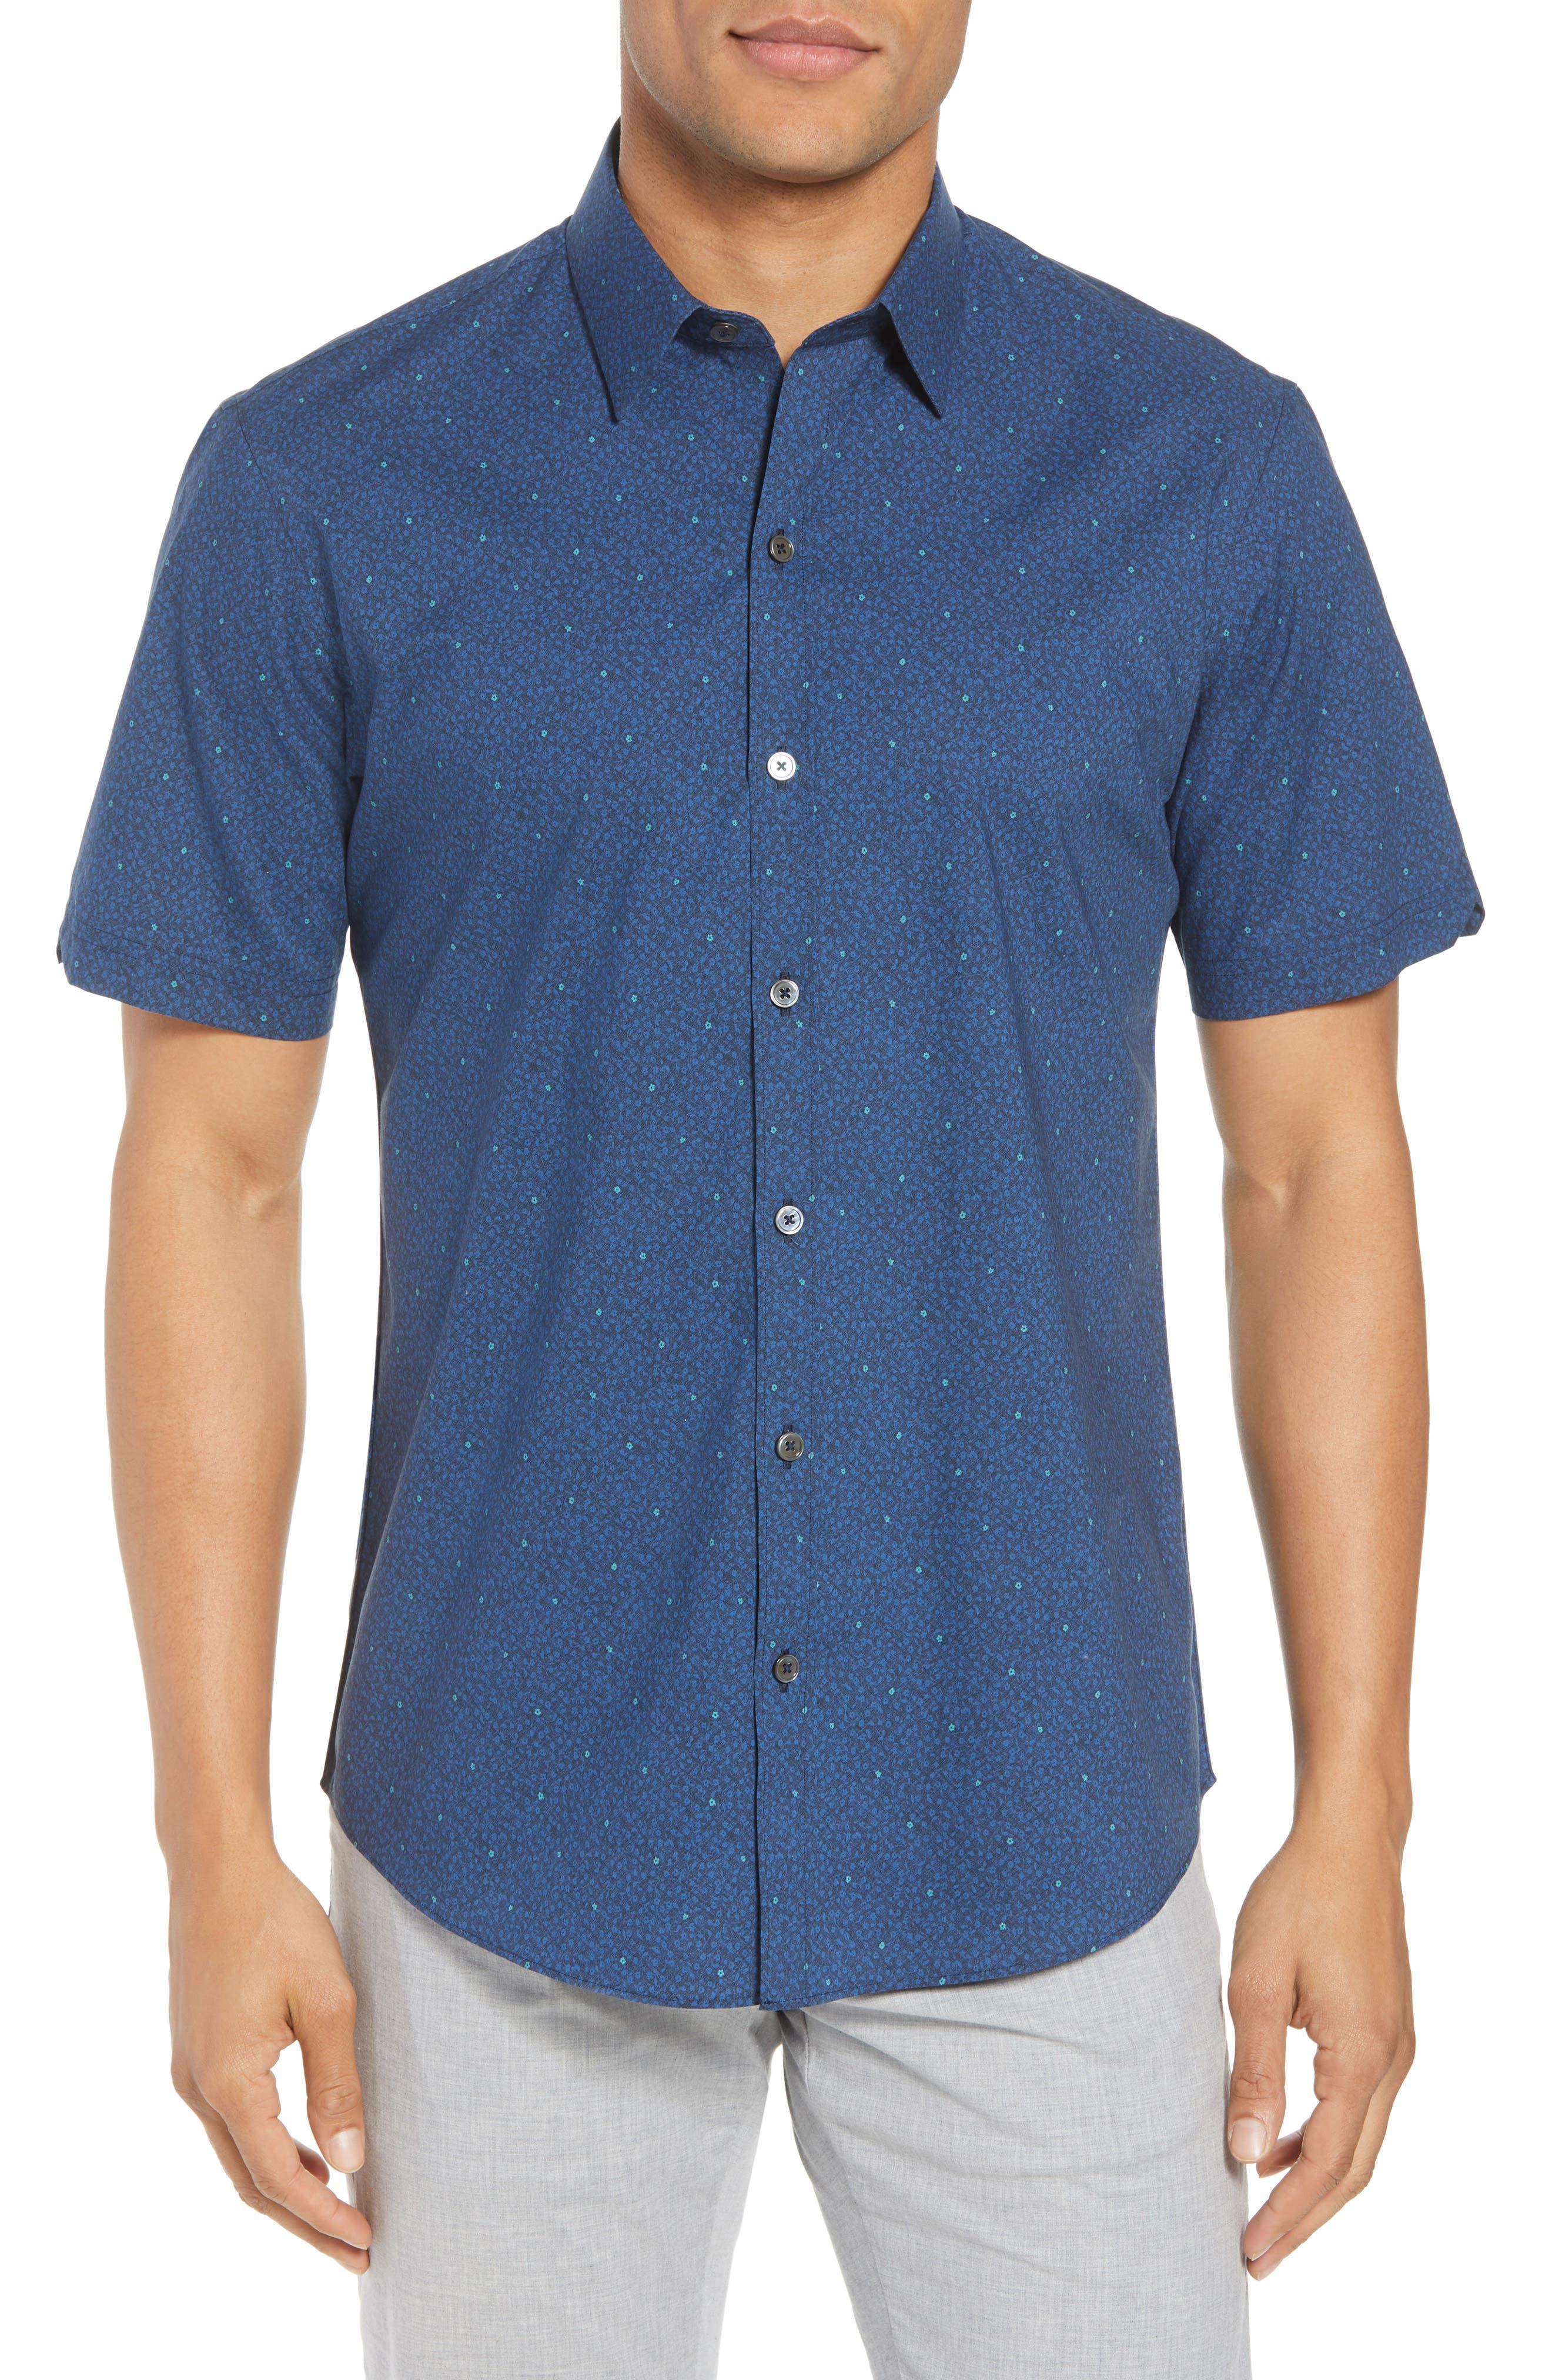 Wichert Trim Fit Floral Print Sport Shirt,                         Main,                         color, Dark Blue